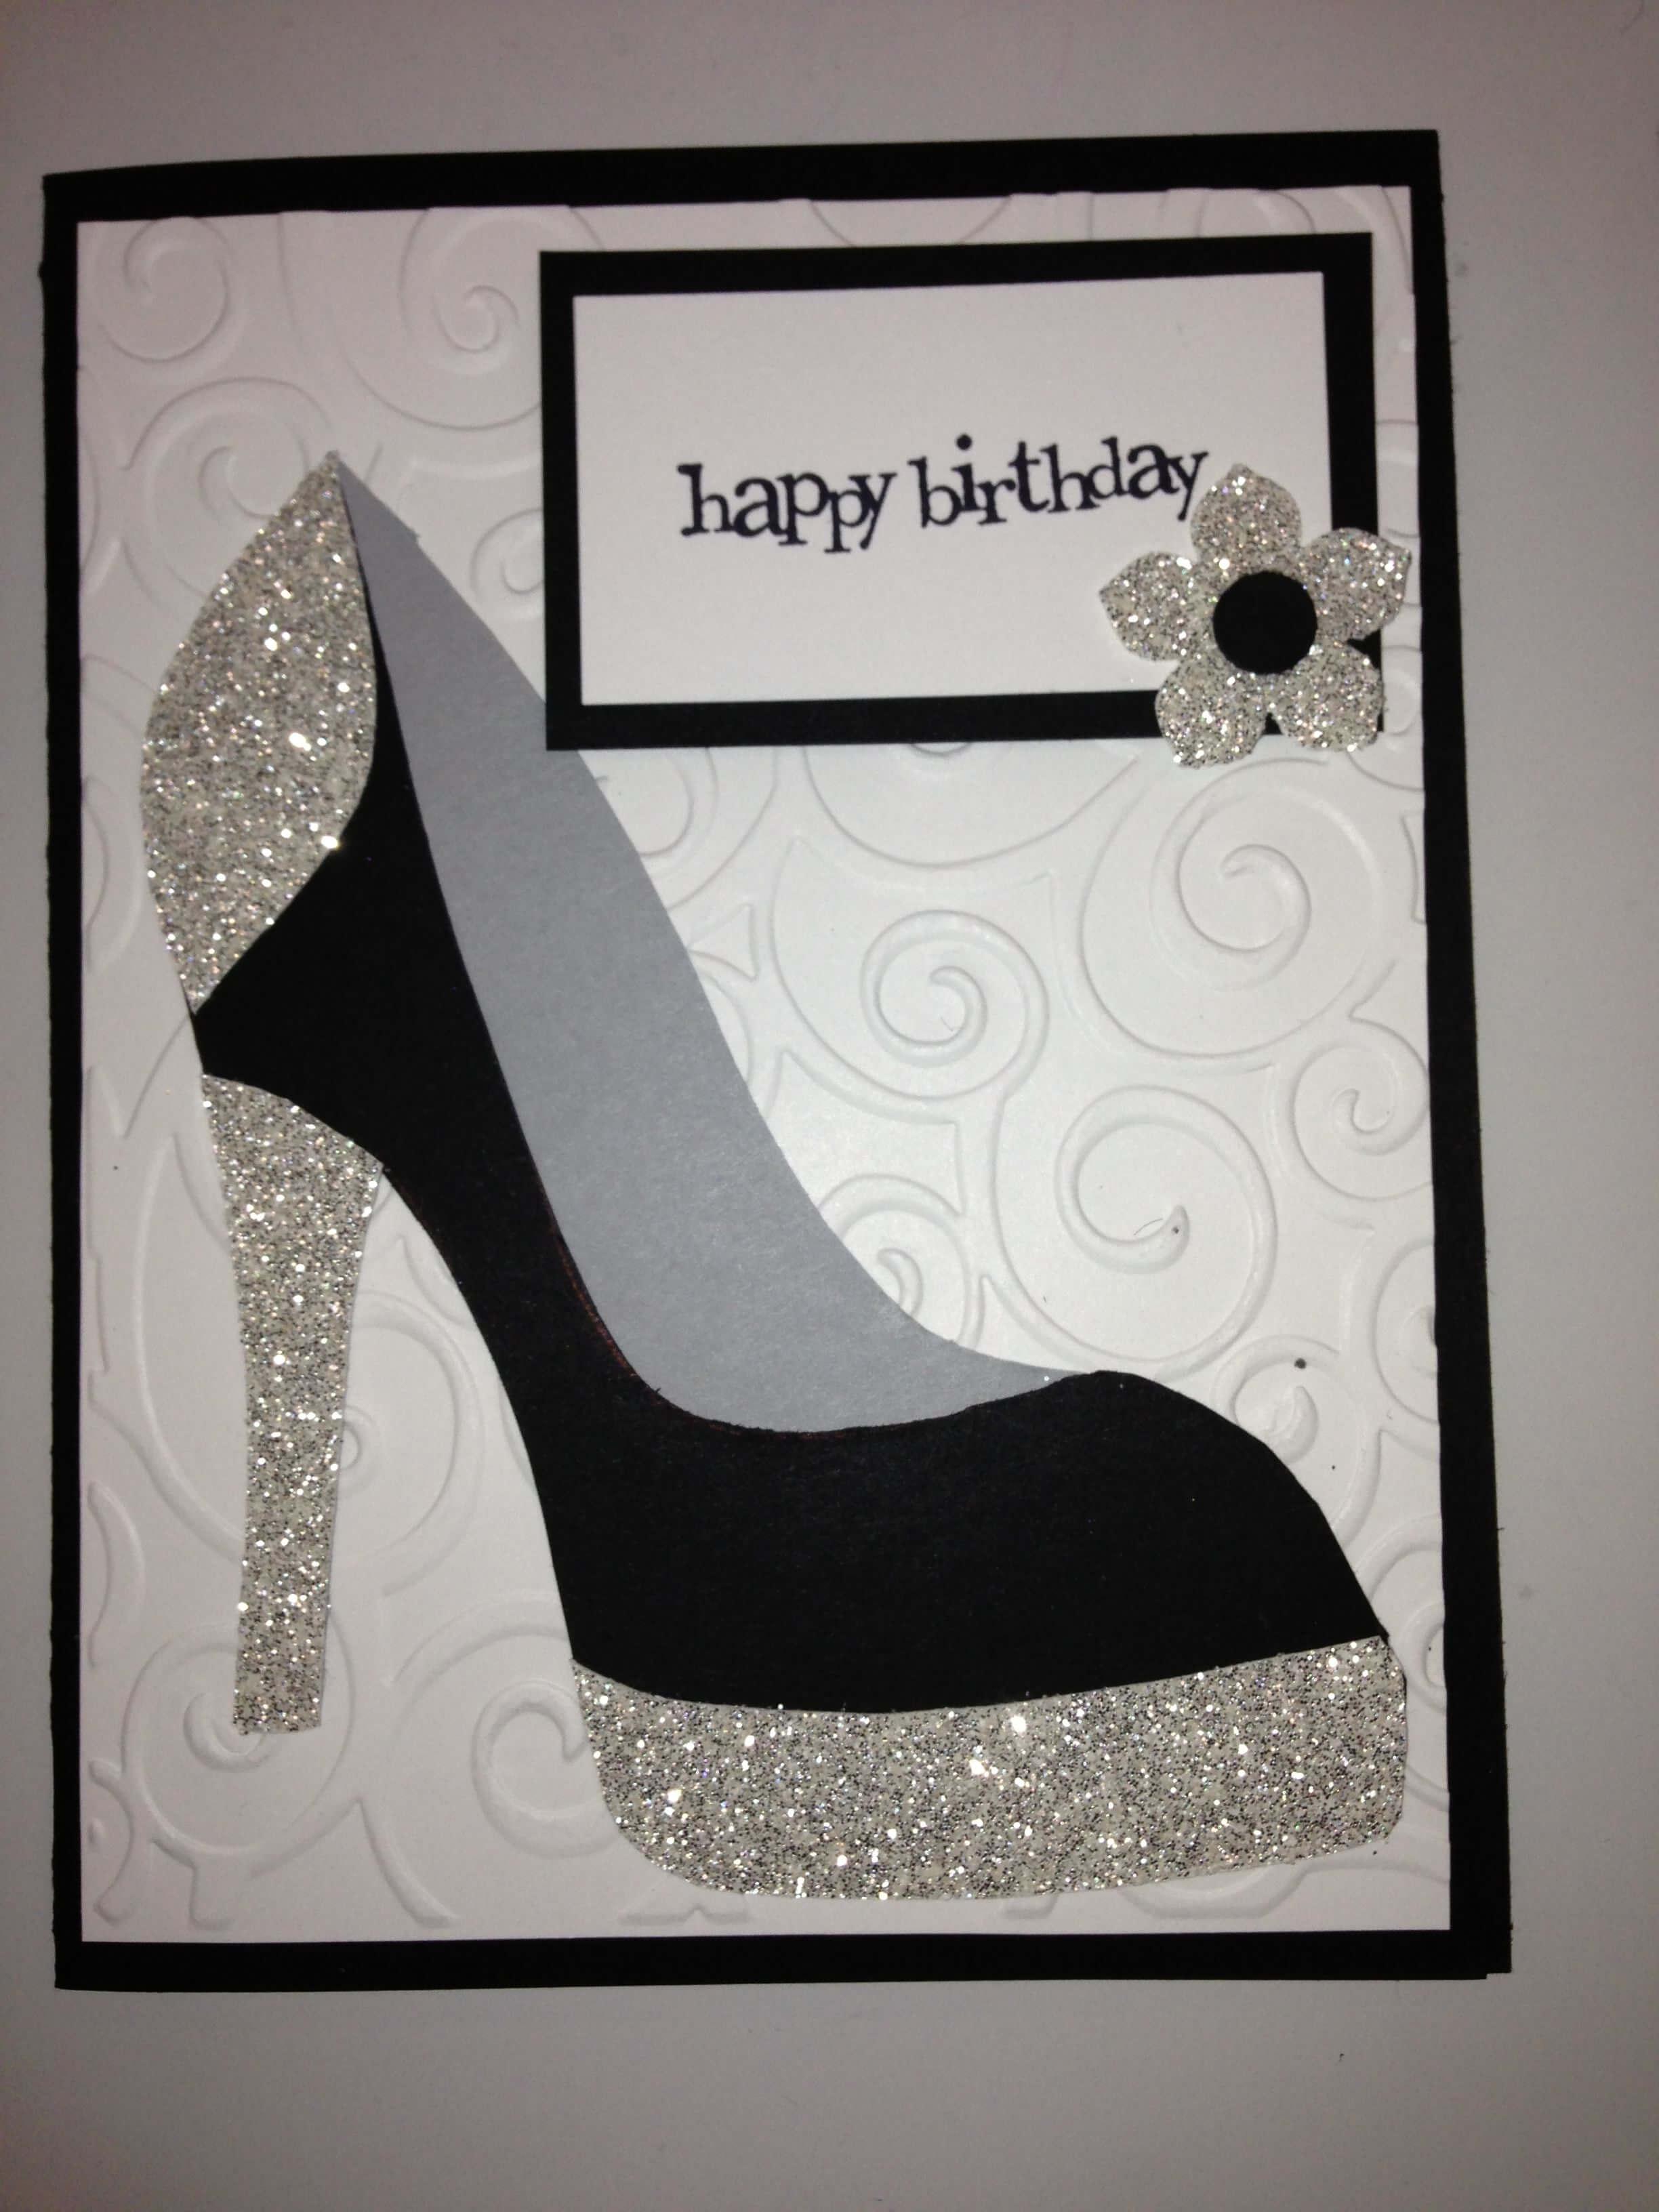 High Heel Shoe Card - Birthday Tanya Bell's High Heel Shoe throughout High Heel Template For Cards